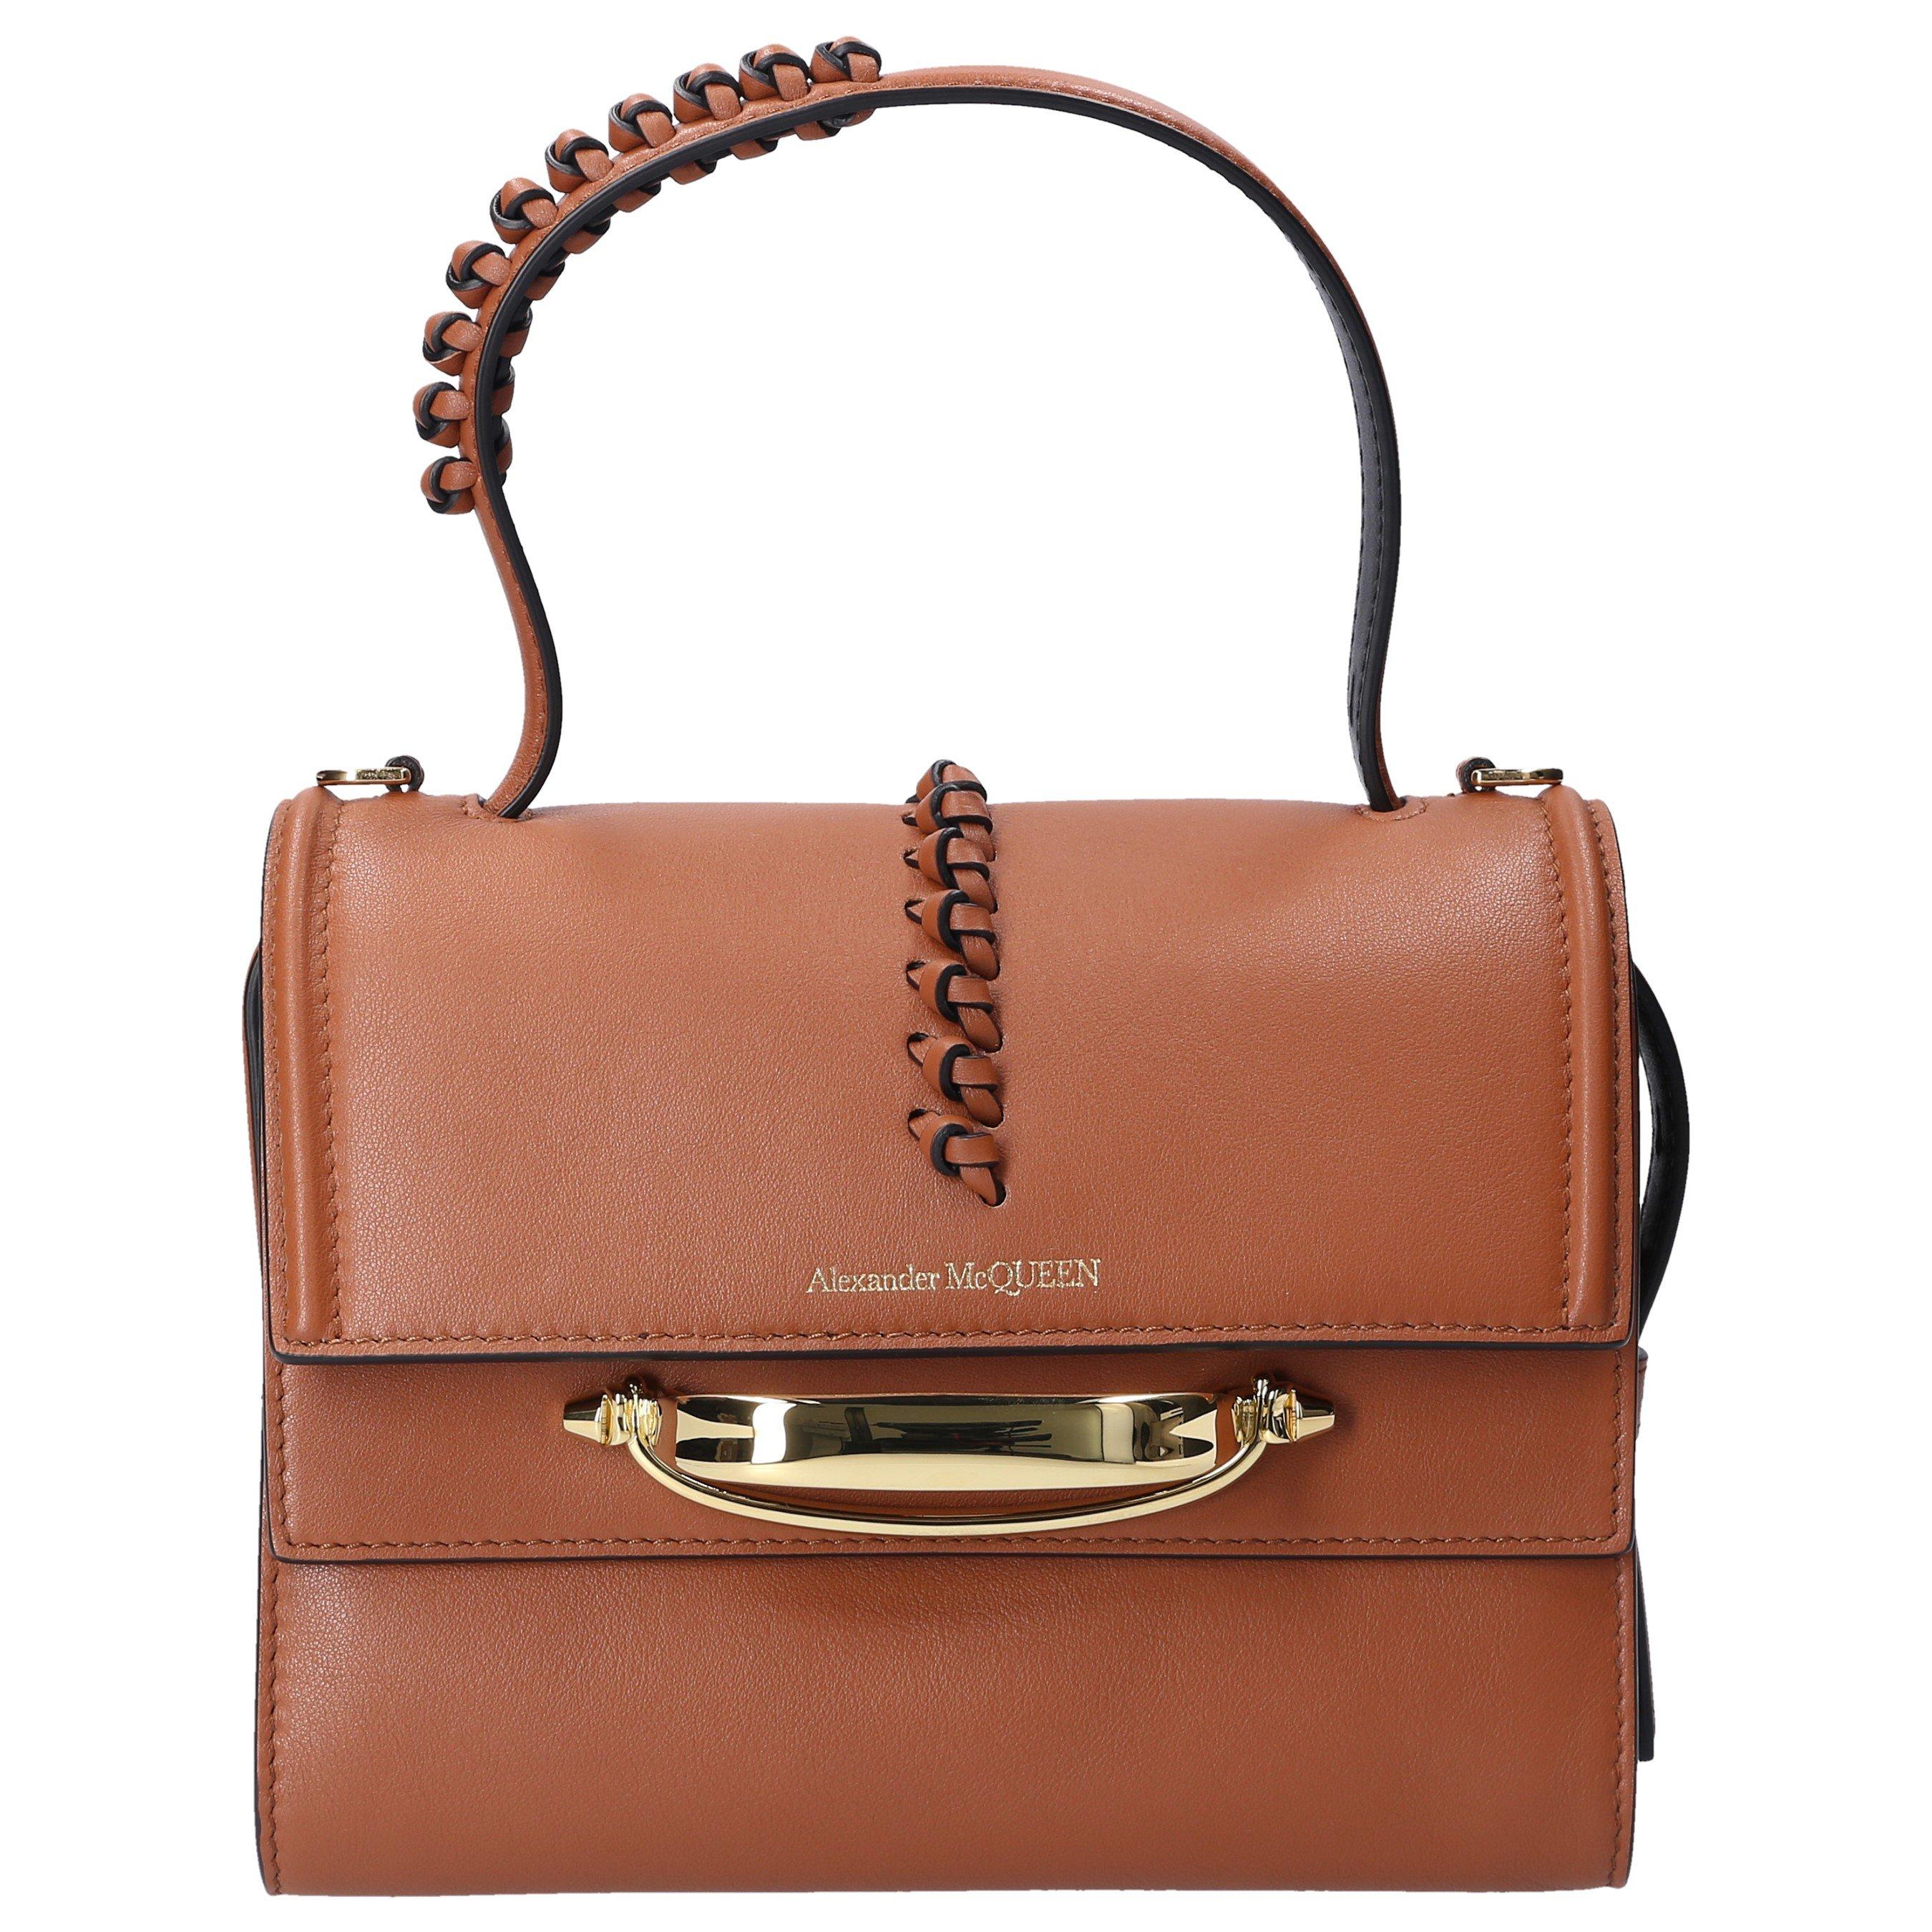 Alexander Mcqueen Women Handbag The Stroy Calfskin Logo Brown